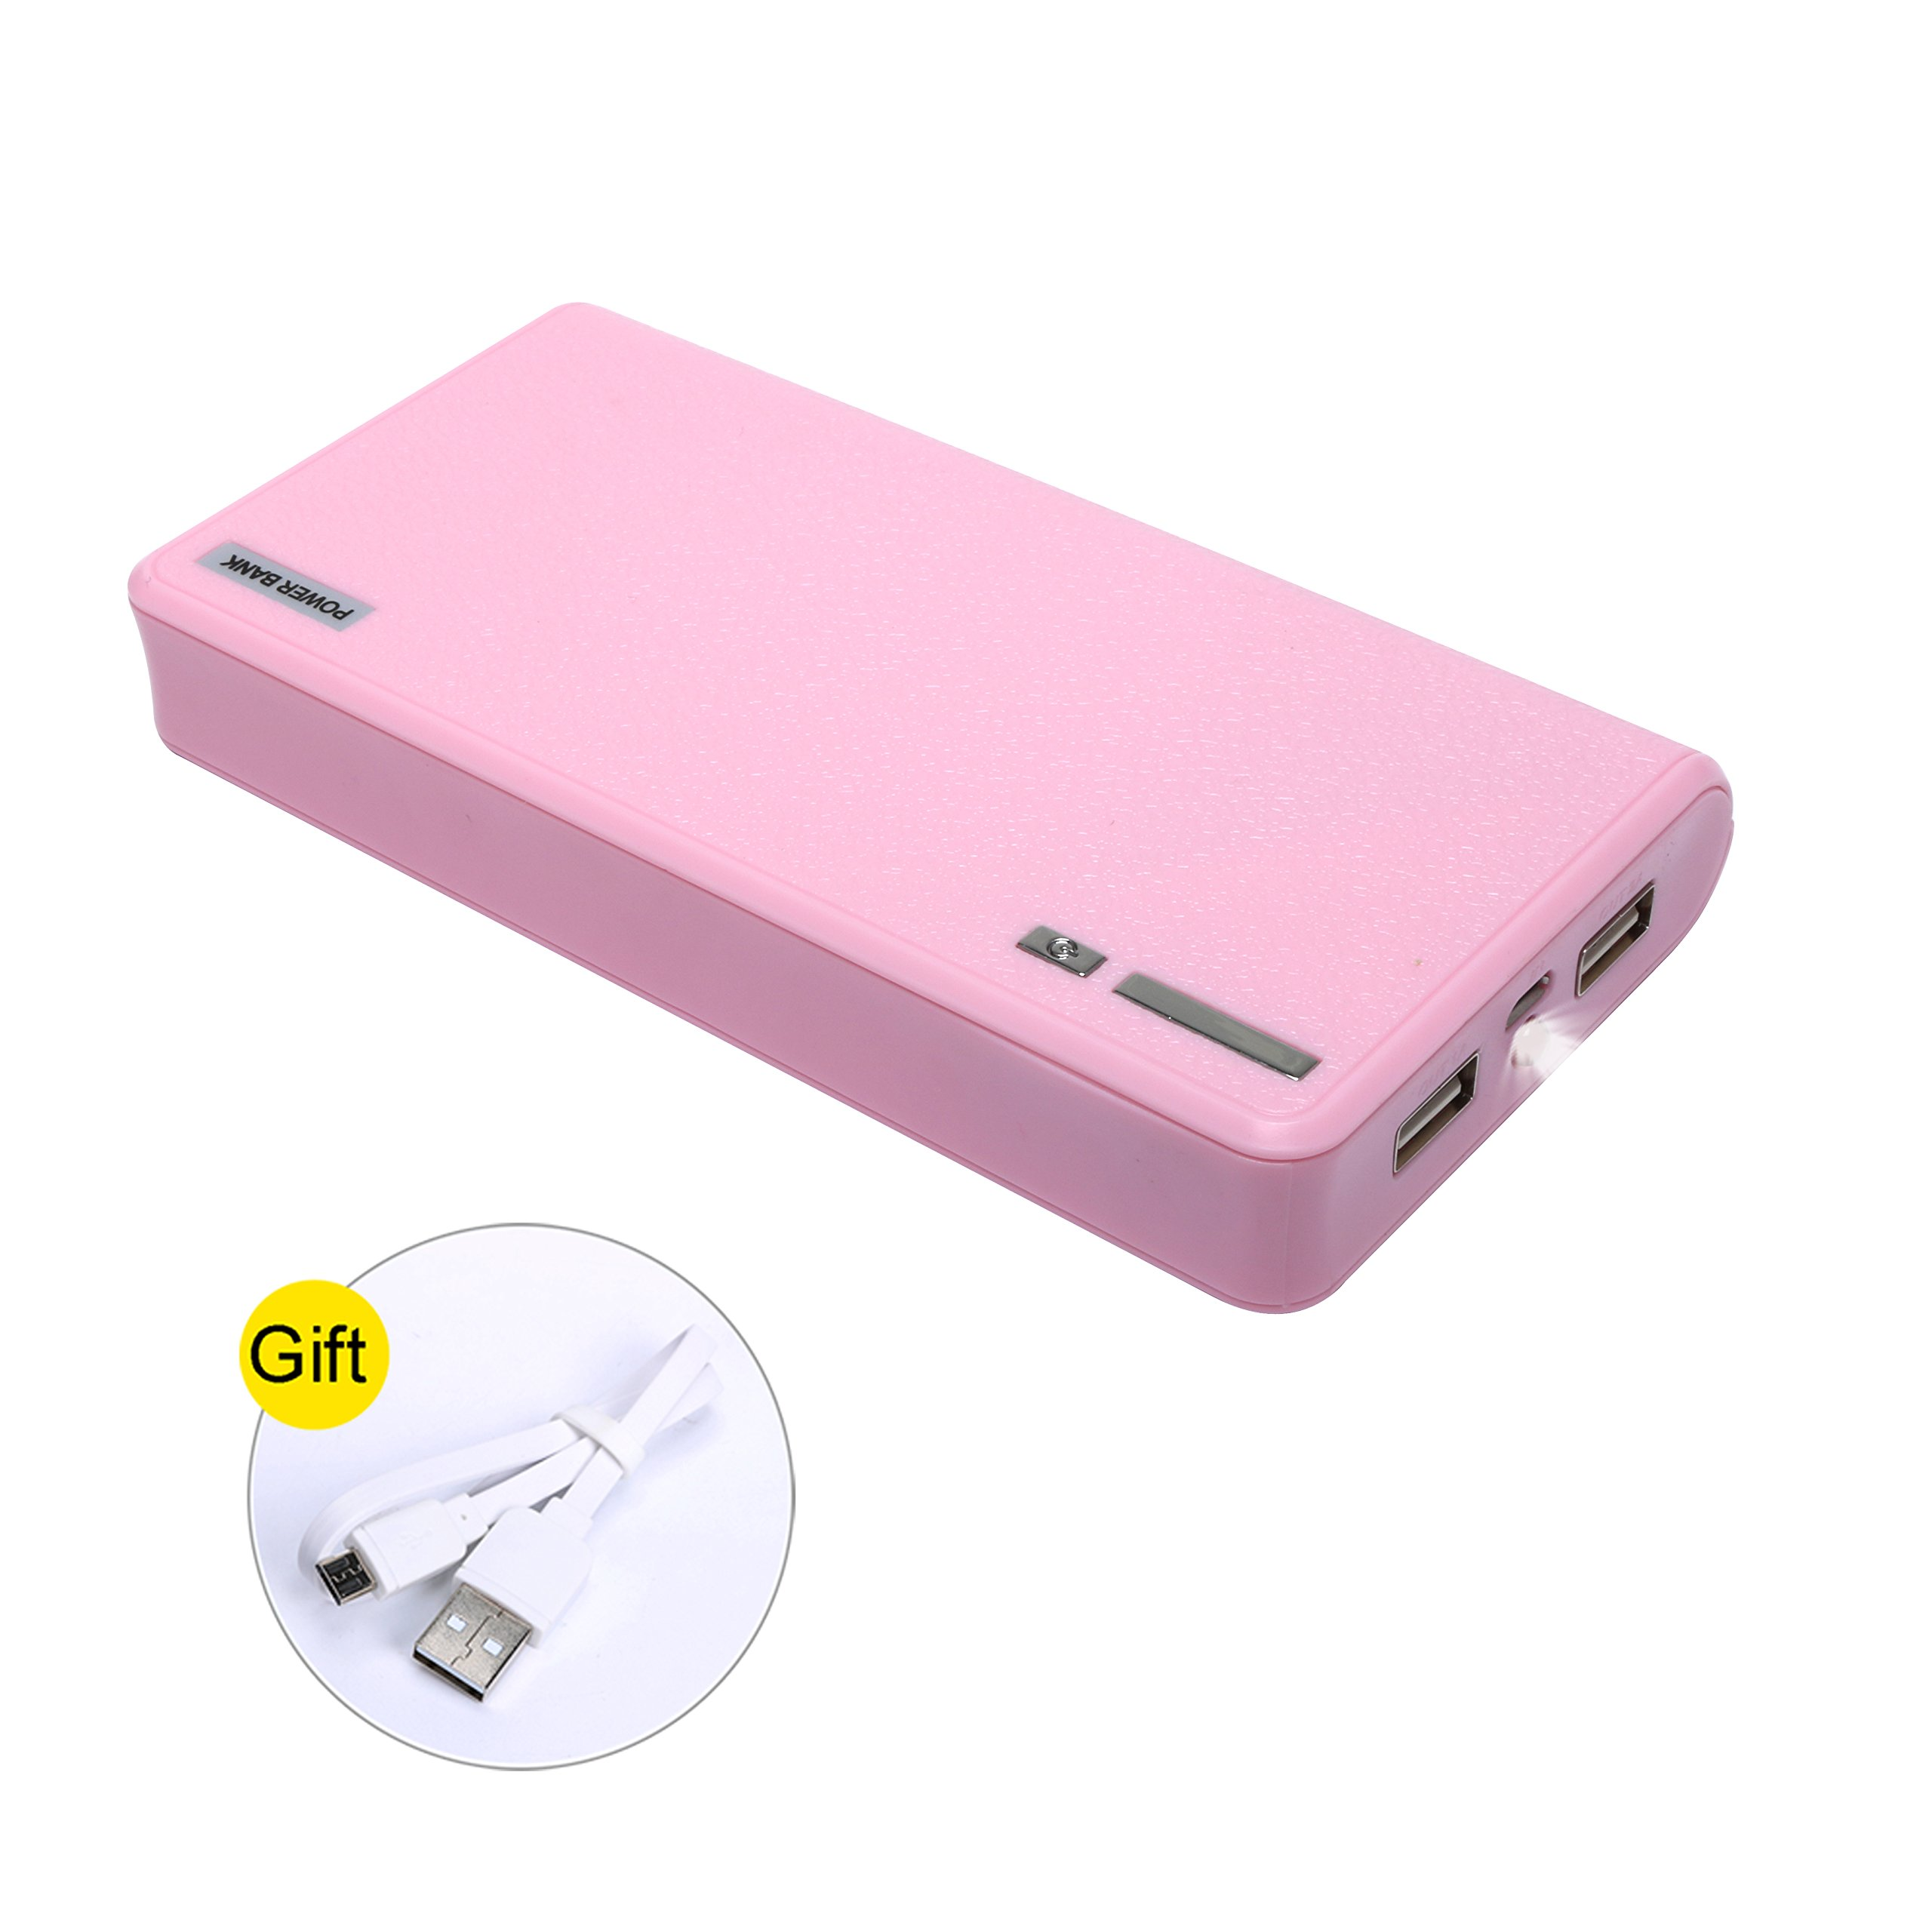 20000mAh Portable Charger Power Bank Ultra High Capacity - Phone Battery Packs Fast Charging for iPhone, iPad & Samsung Galaxy & More (PINK)